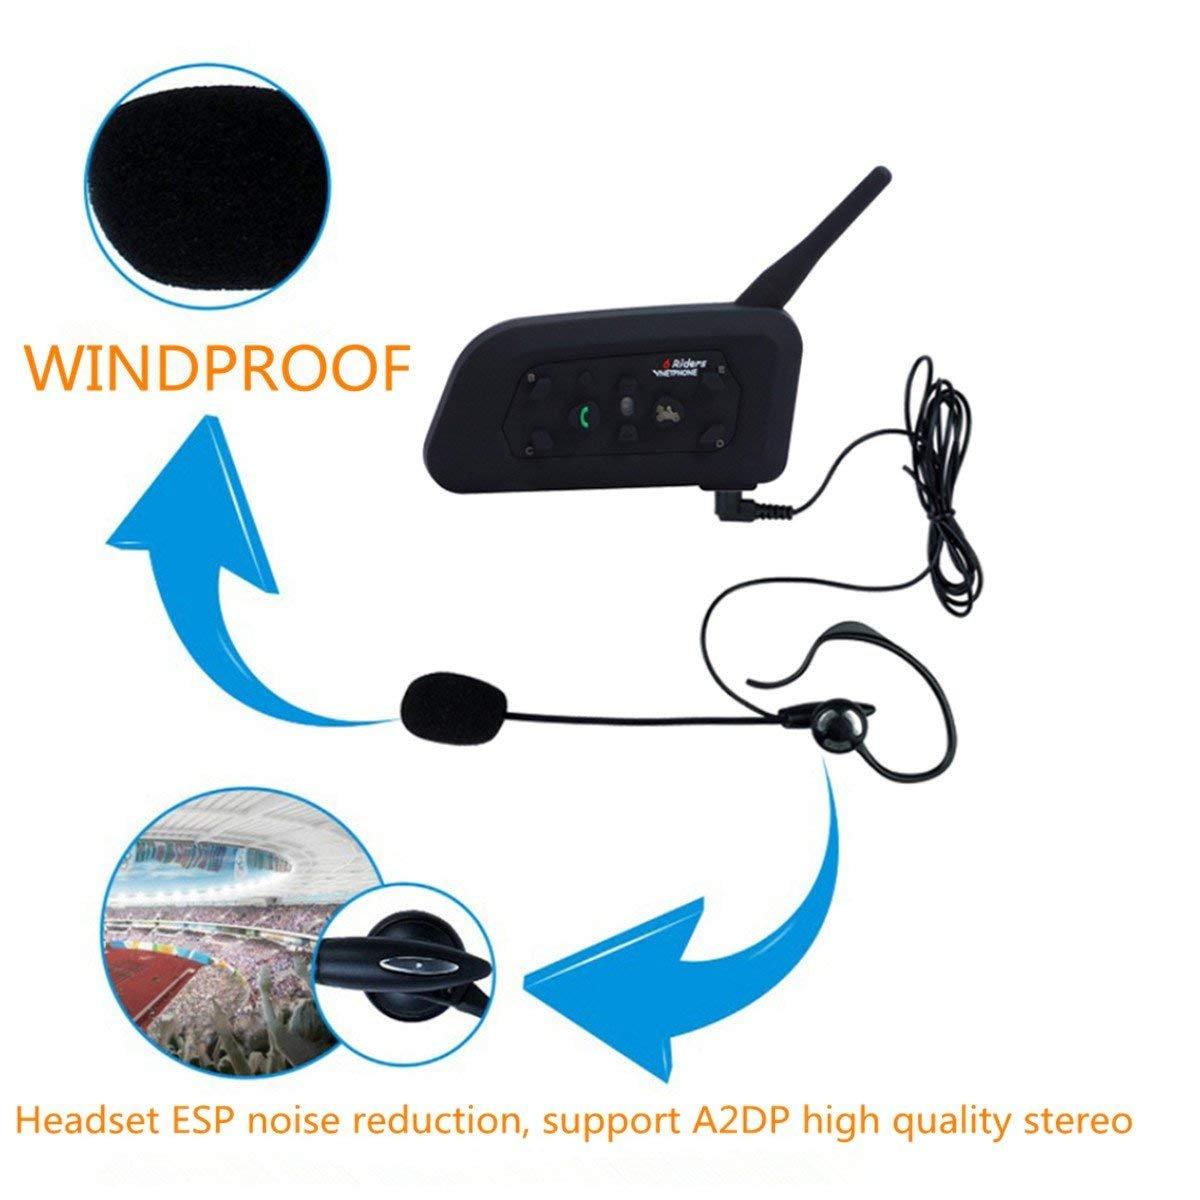 V6C BT 3.0 Bluetooth Intercom Full Duplex Scooter Referee Interphone with Armband 6 riders Wireless Waterproof Motorcycle Helmet Earpiece ESoku 4350353407